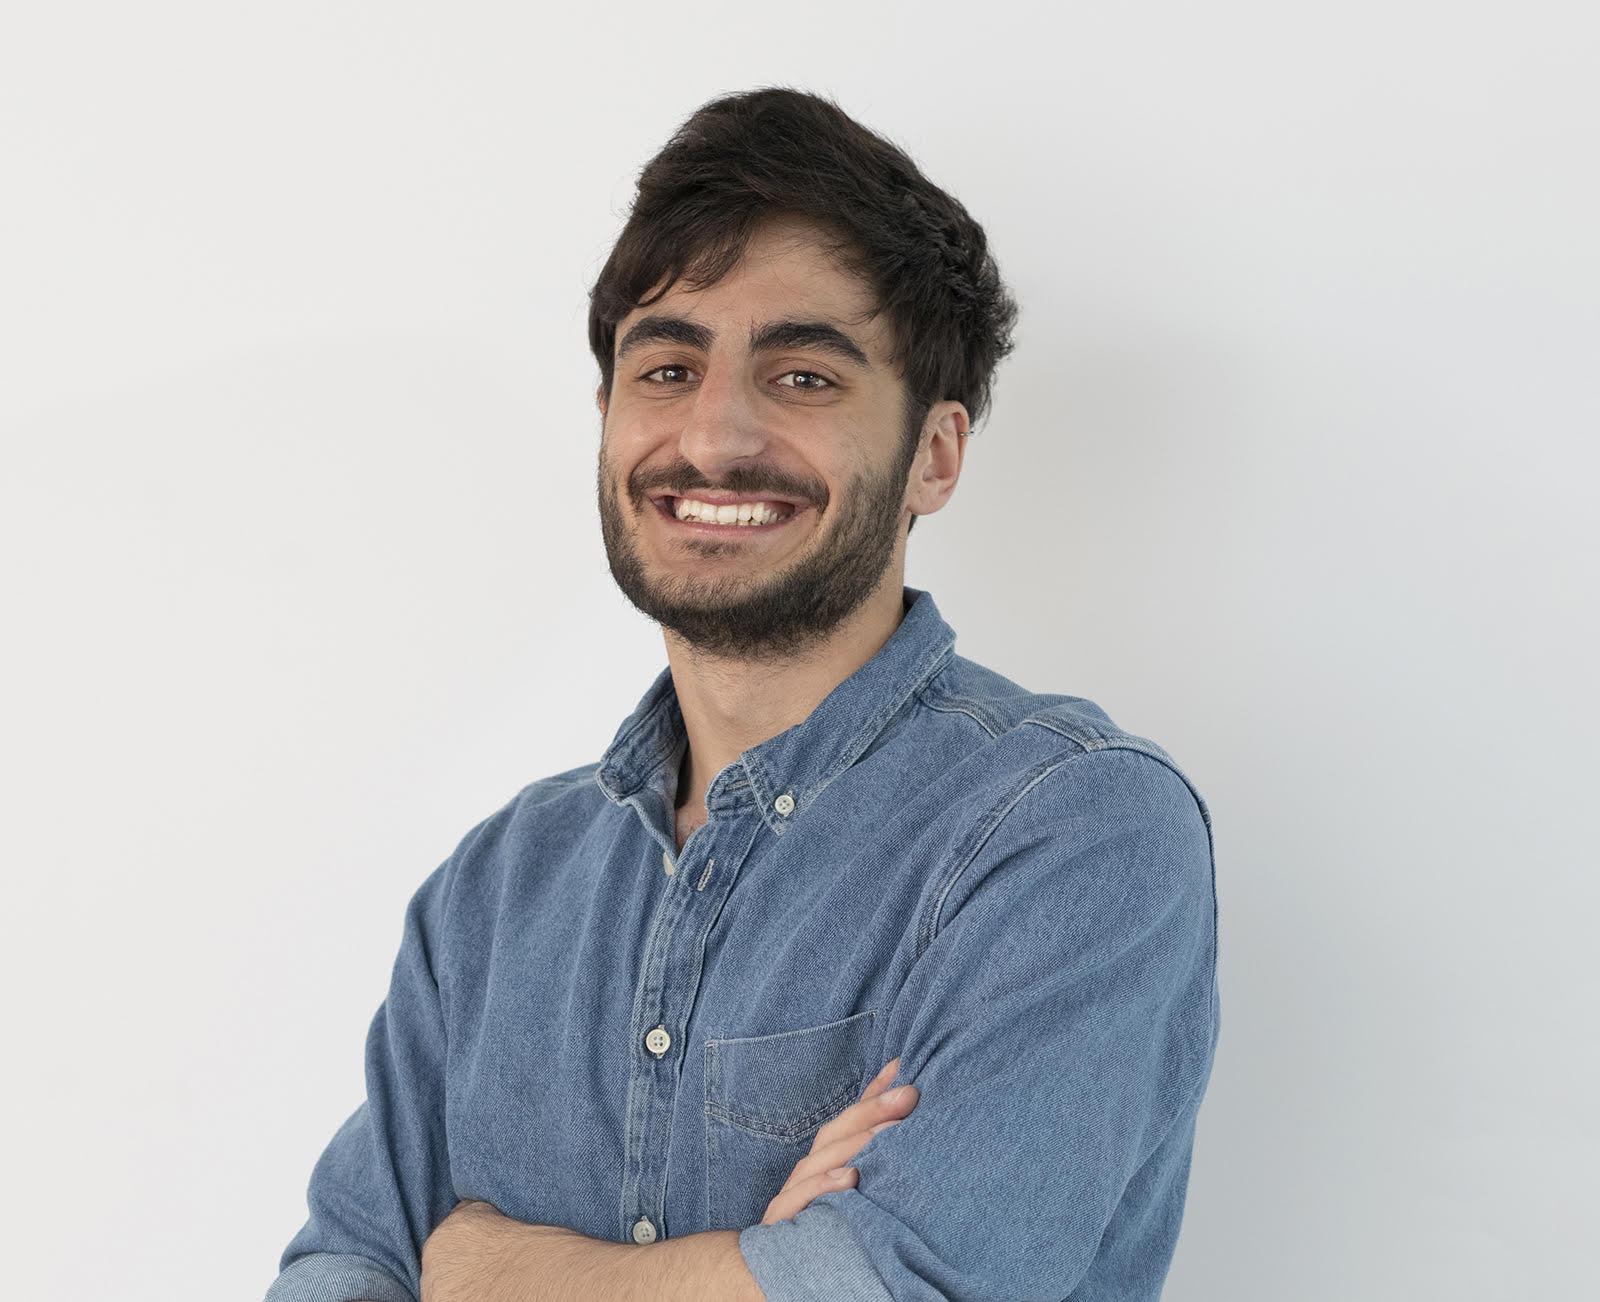 Maor Shlomo - Co-Founder, Explorium